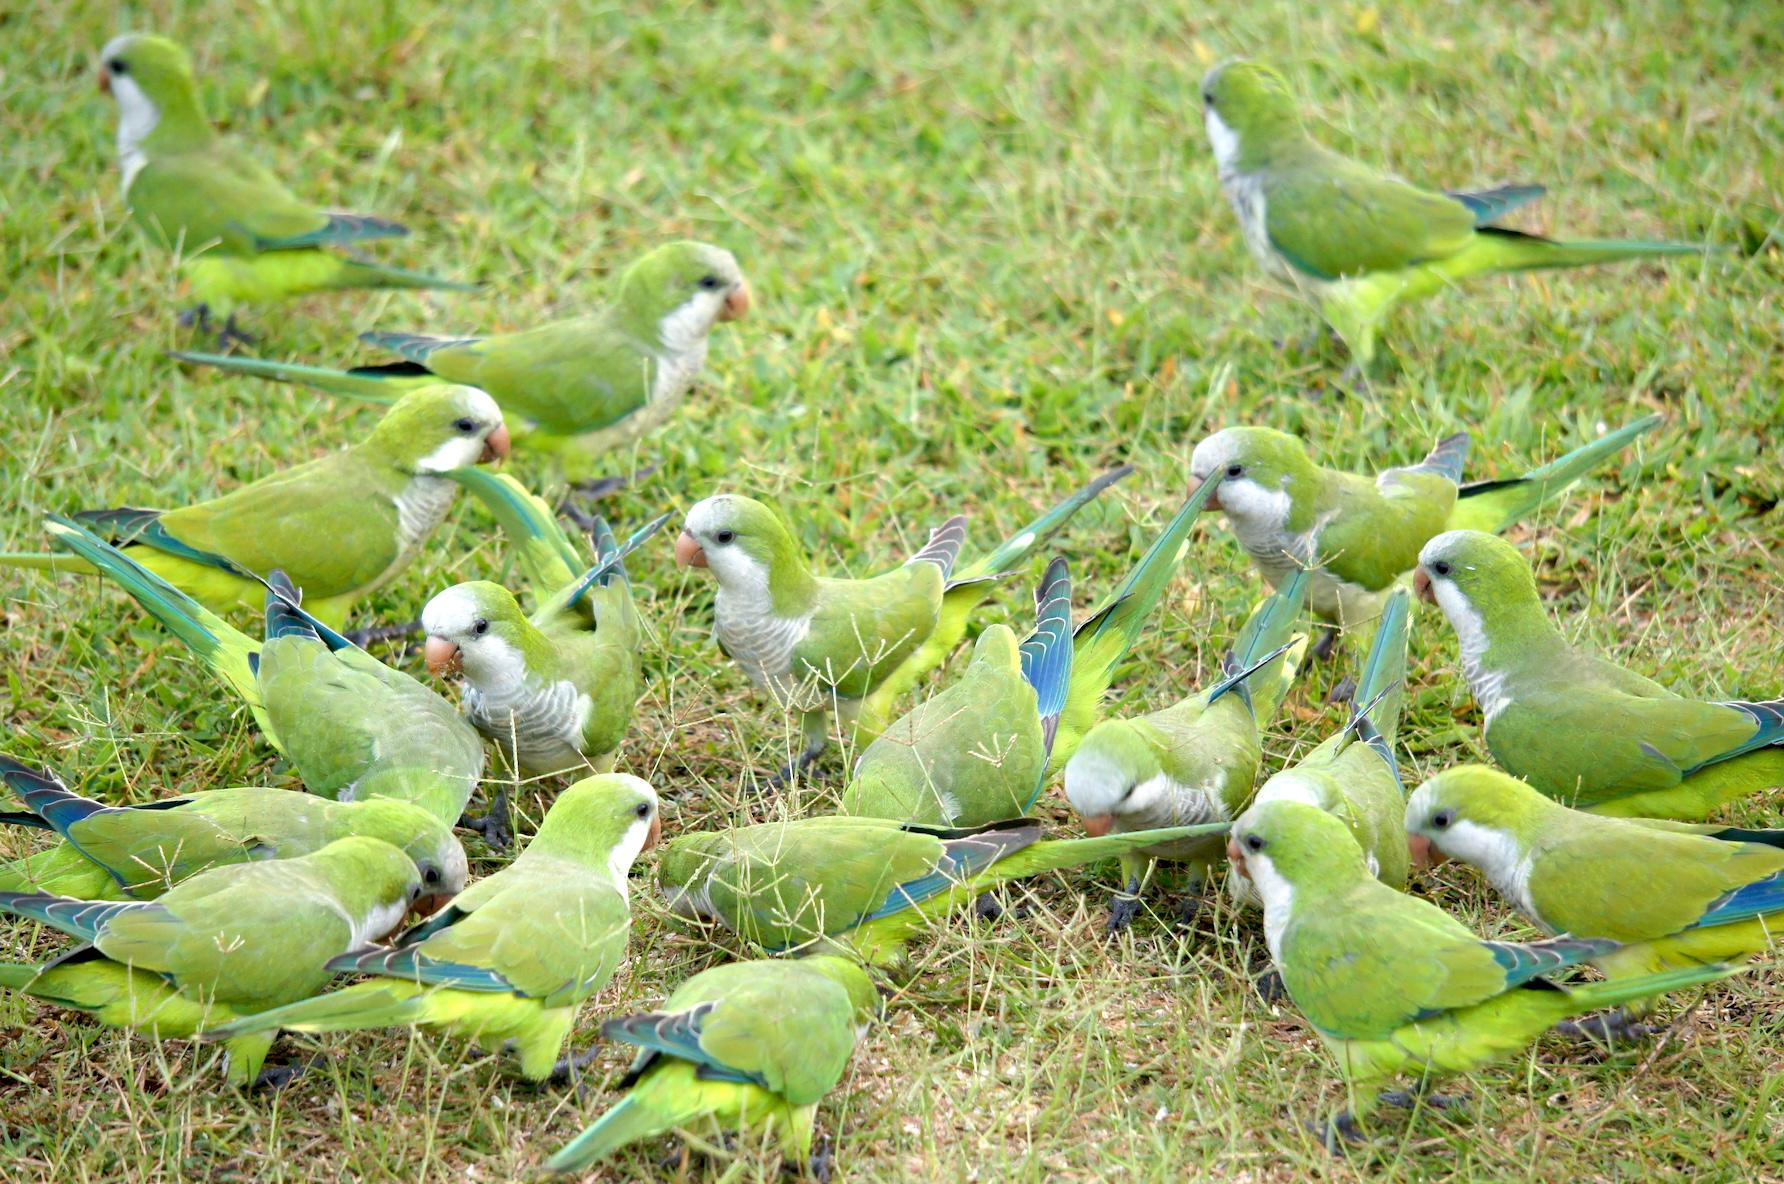 Попугаи в Пантанале